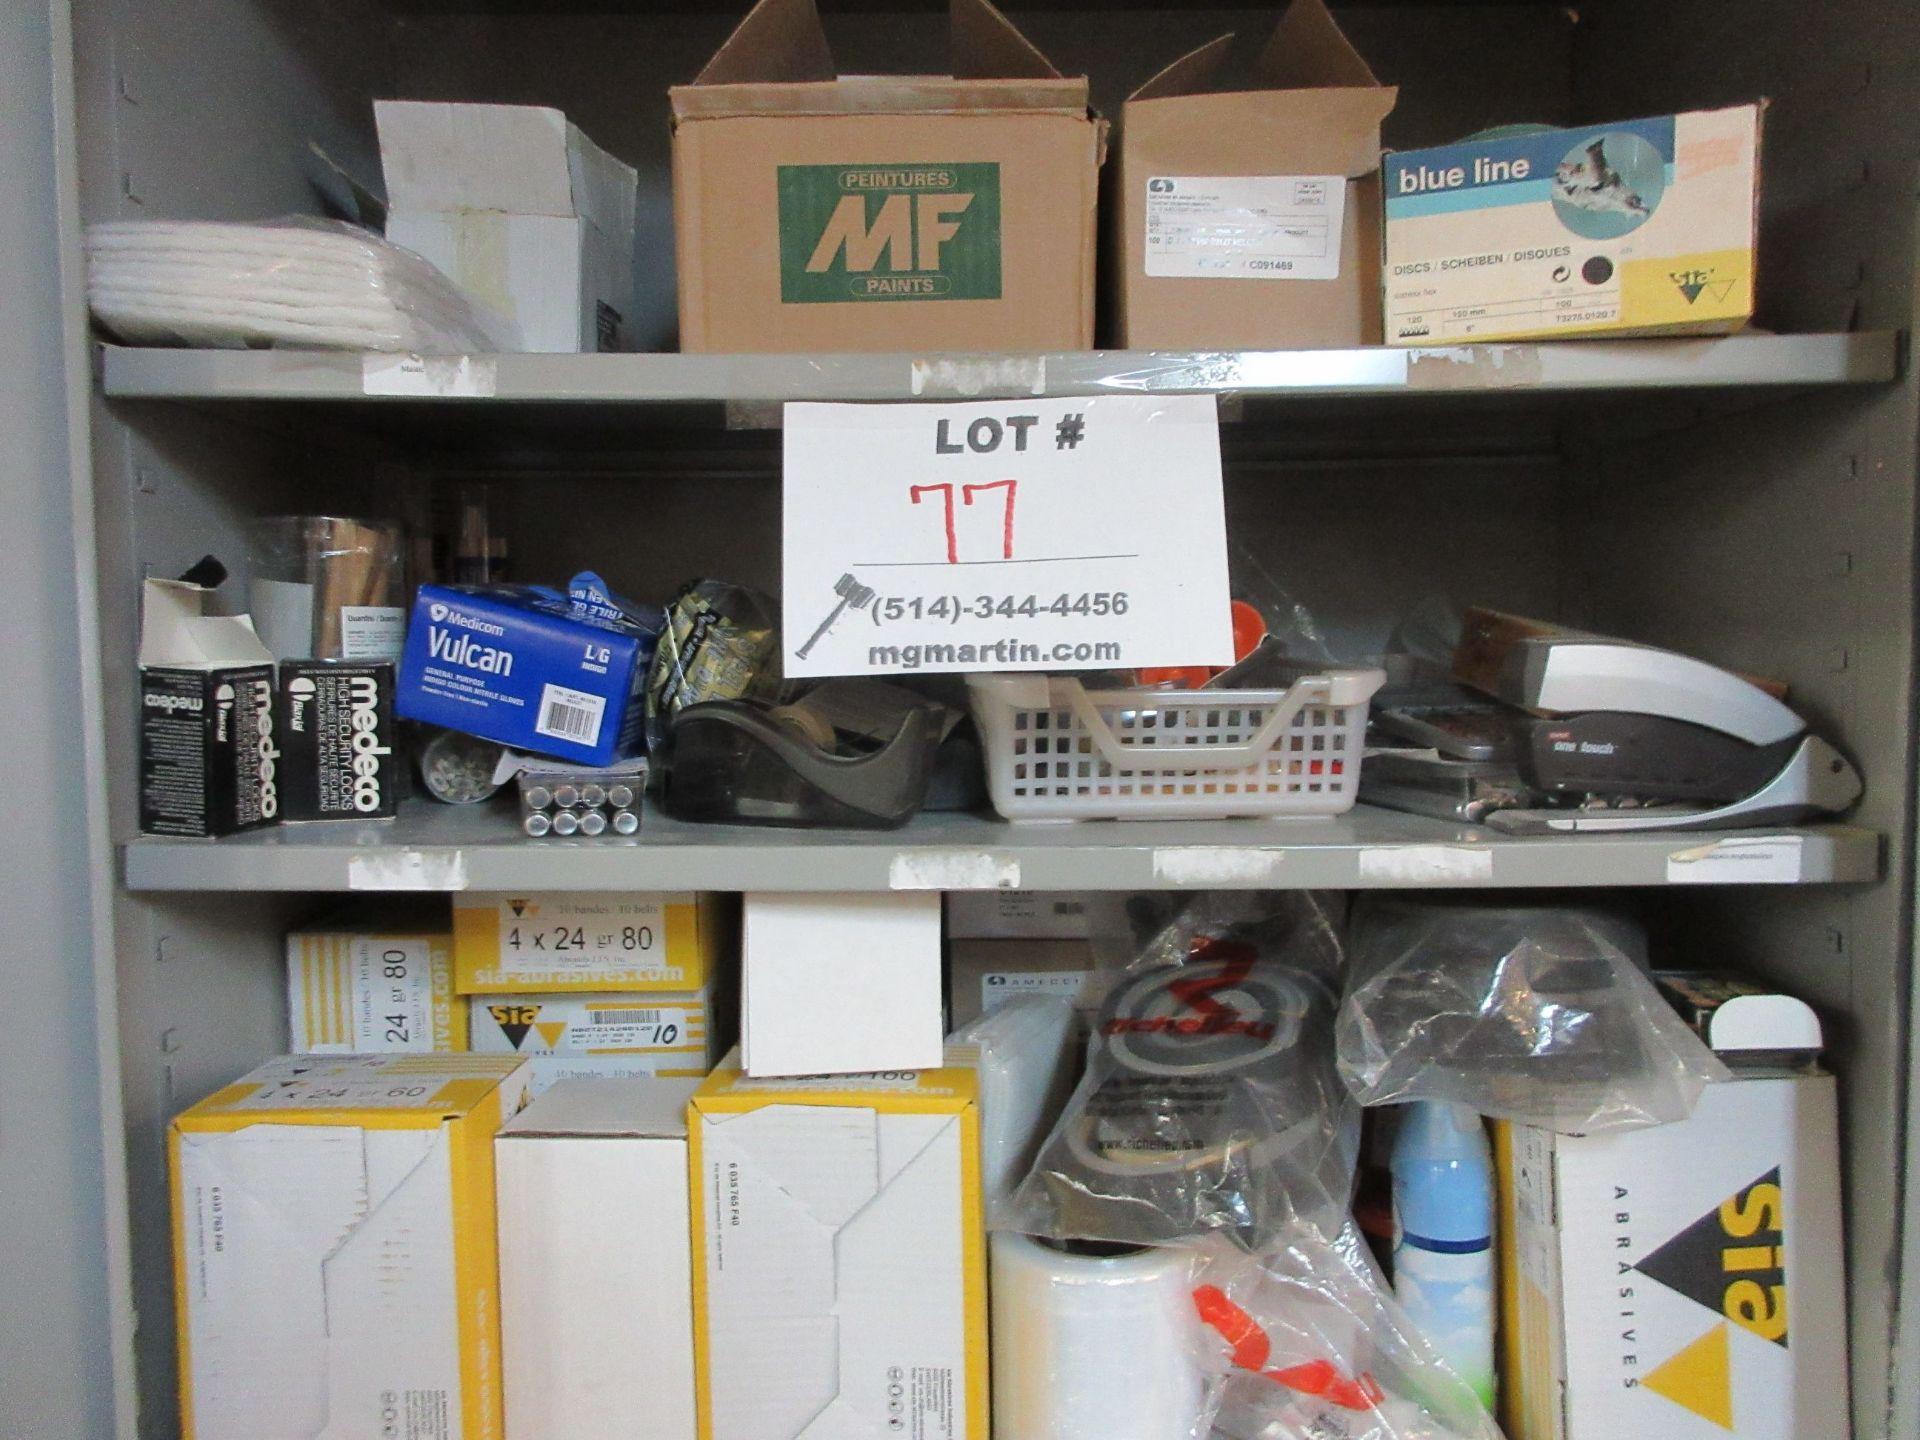 LOT including cabinets, sandpaper, tape, etc. - Image 2 of 3